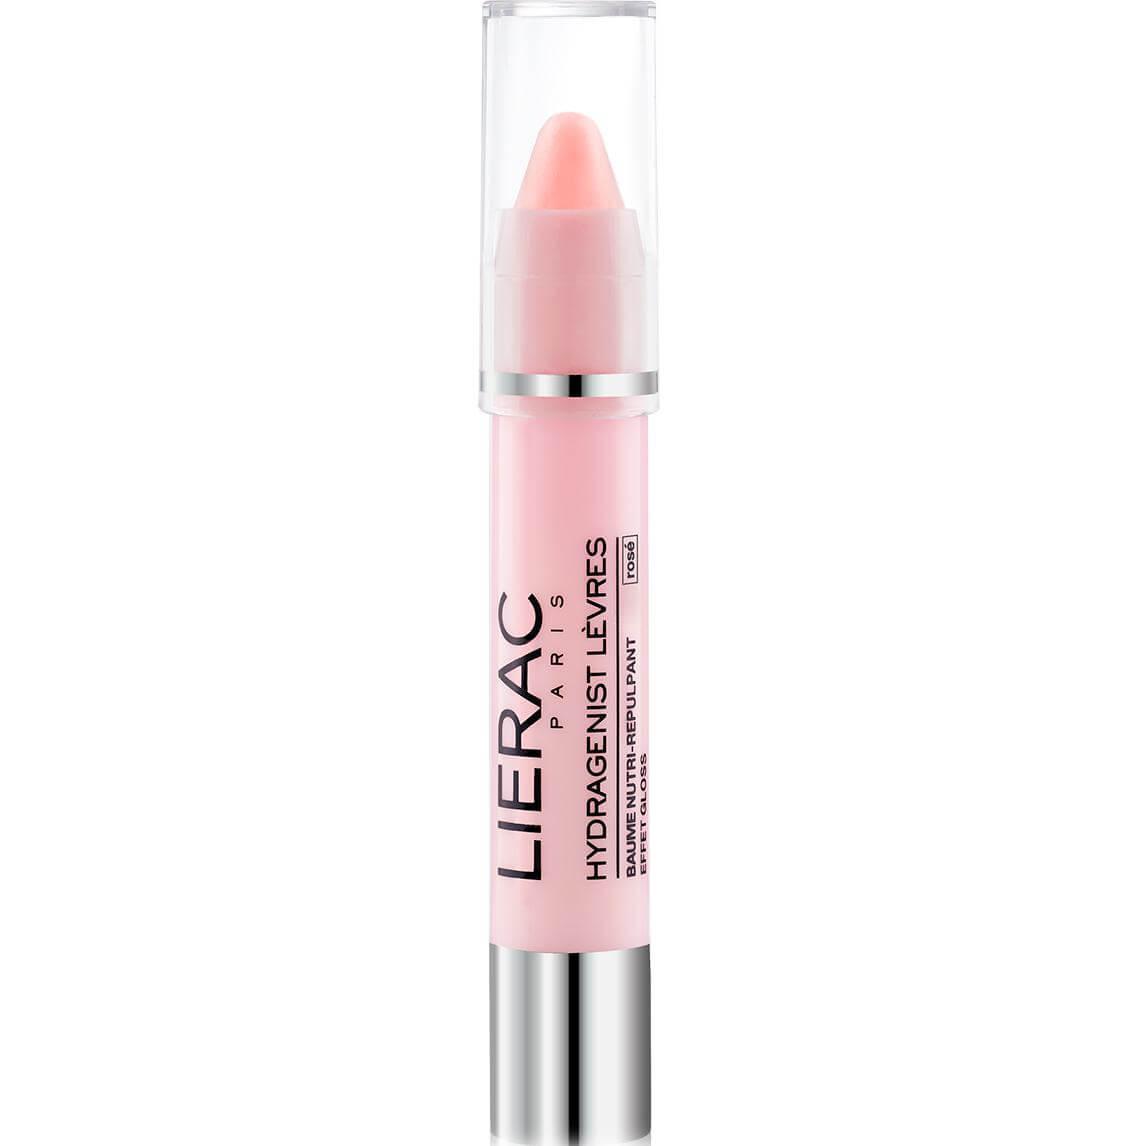 Lierac Hydragenist Lips Nutri Replumping Balm Rose Βάλσαμο Θρέψης & Επαναπύκνωσης για τα Χείλη με Αποτέλεσμα Ροζ Gloss 3g